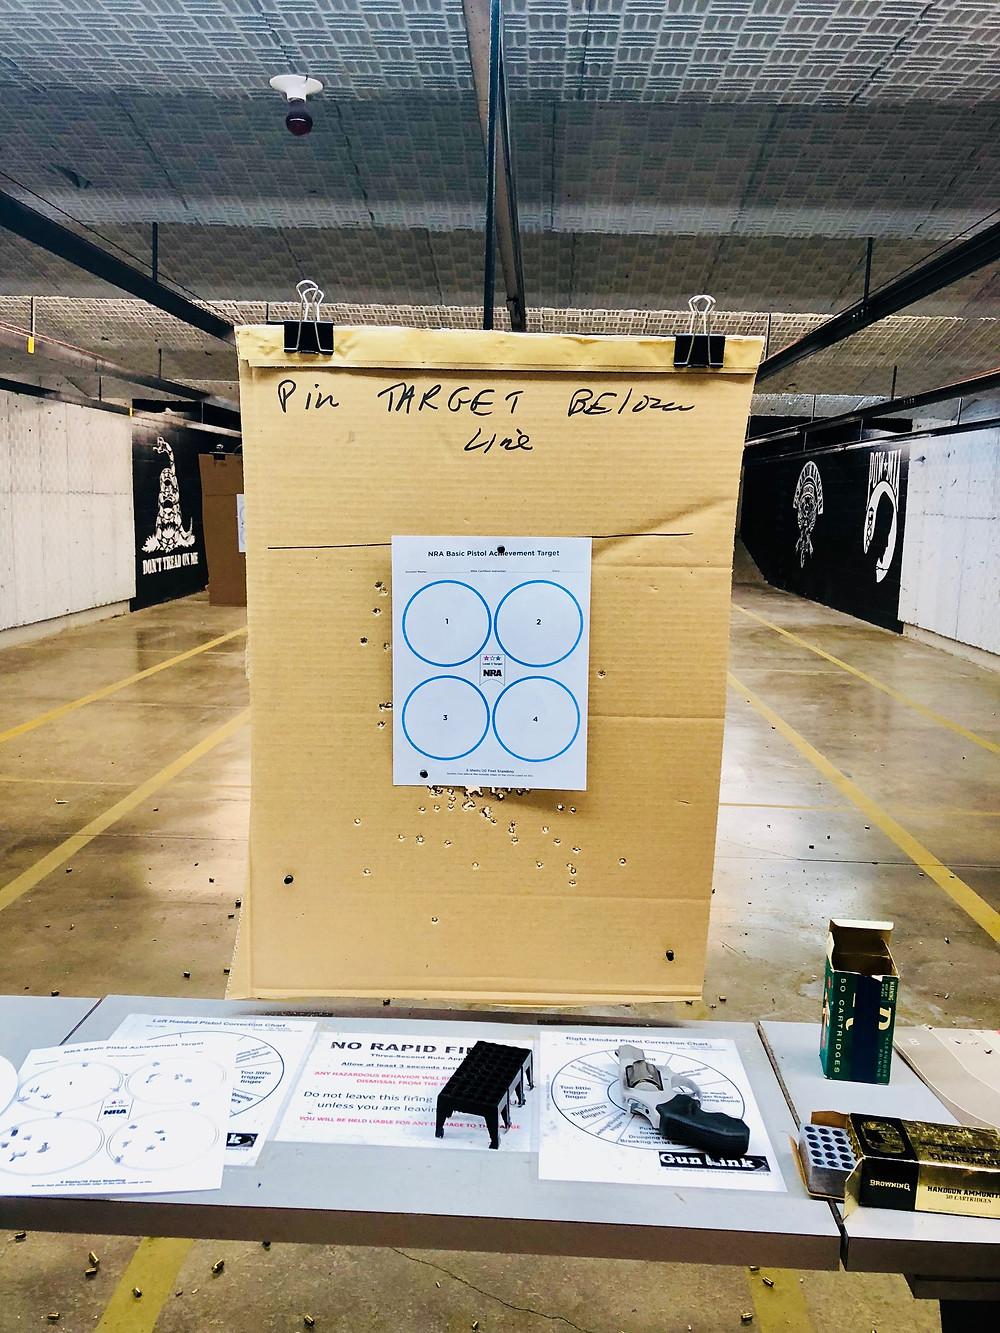 NRA Basic Pistol Level 2 (blue) qualification target